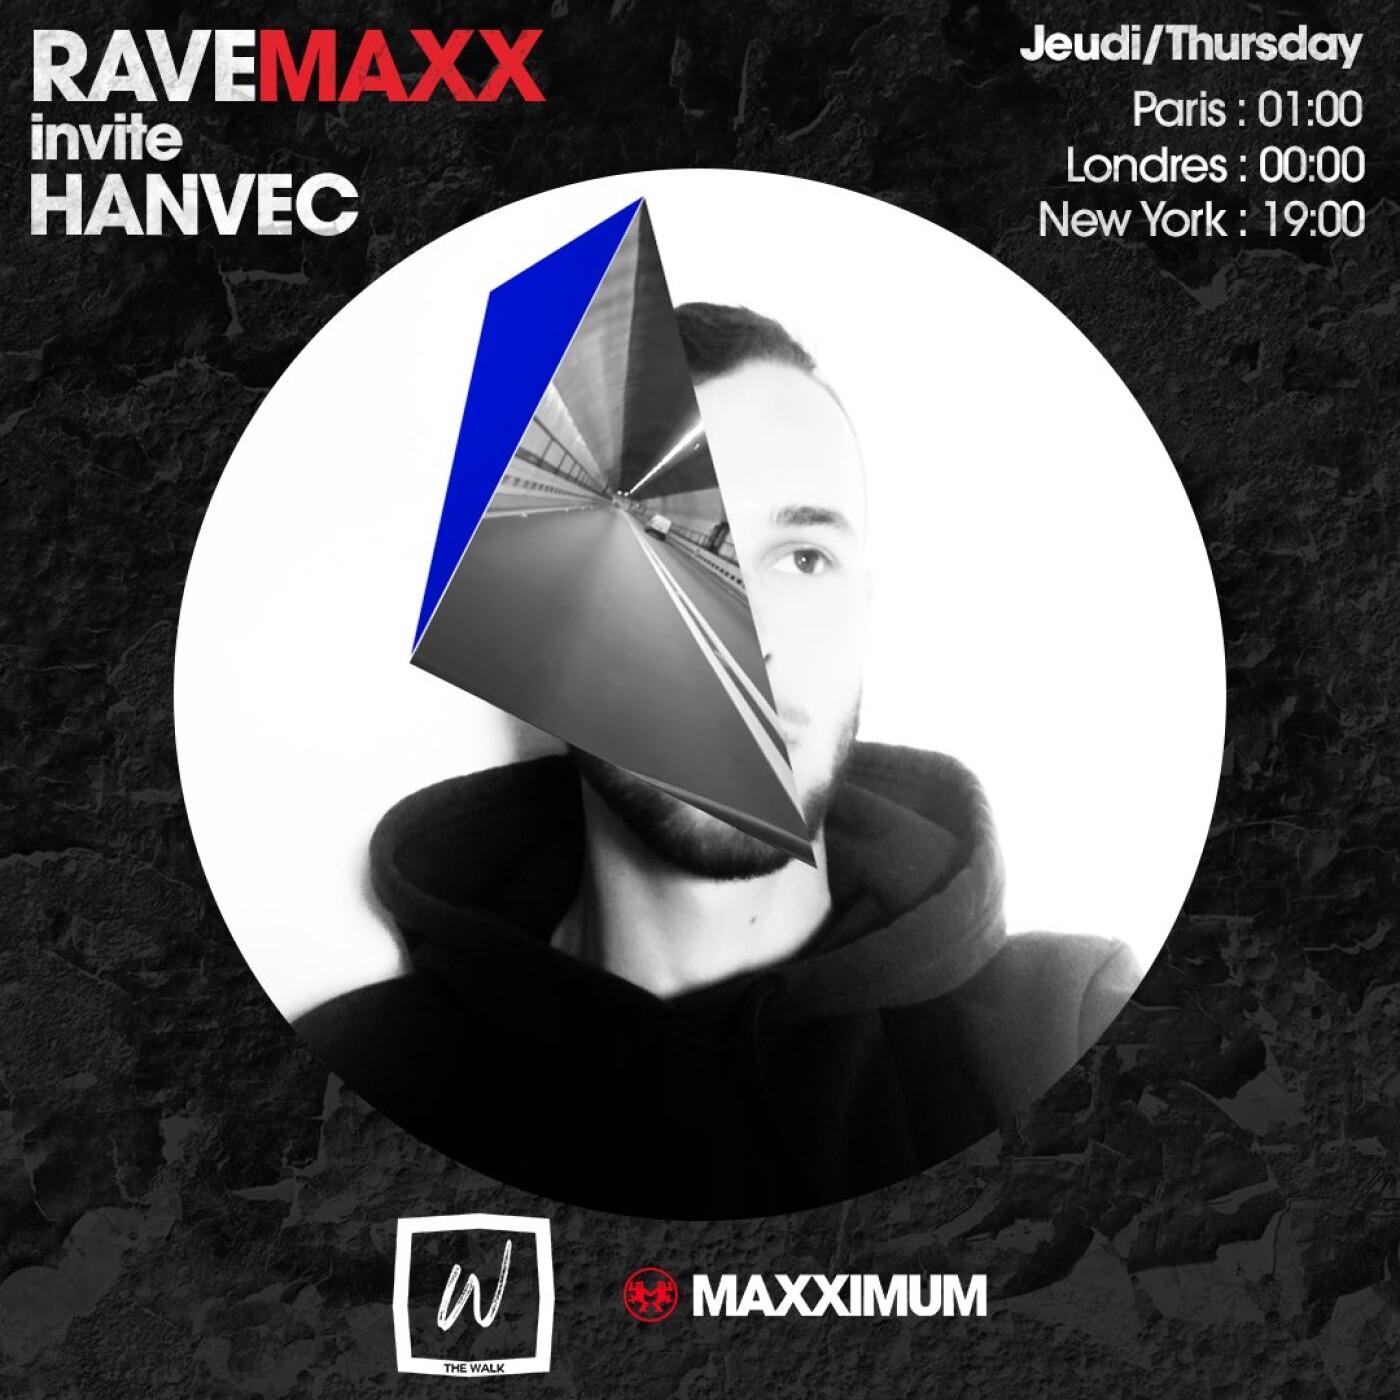 RAVEMAXX : NUIT DUB TECHNO BY THE WALK AVEC HANVEC